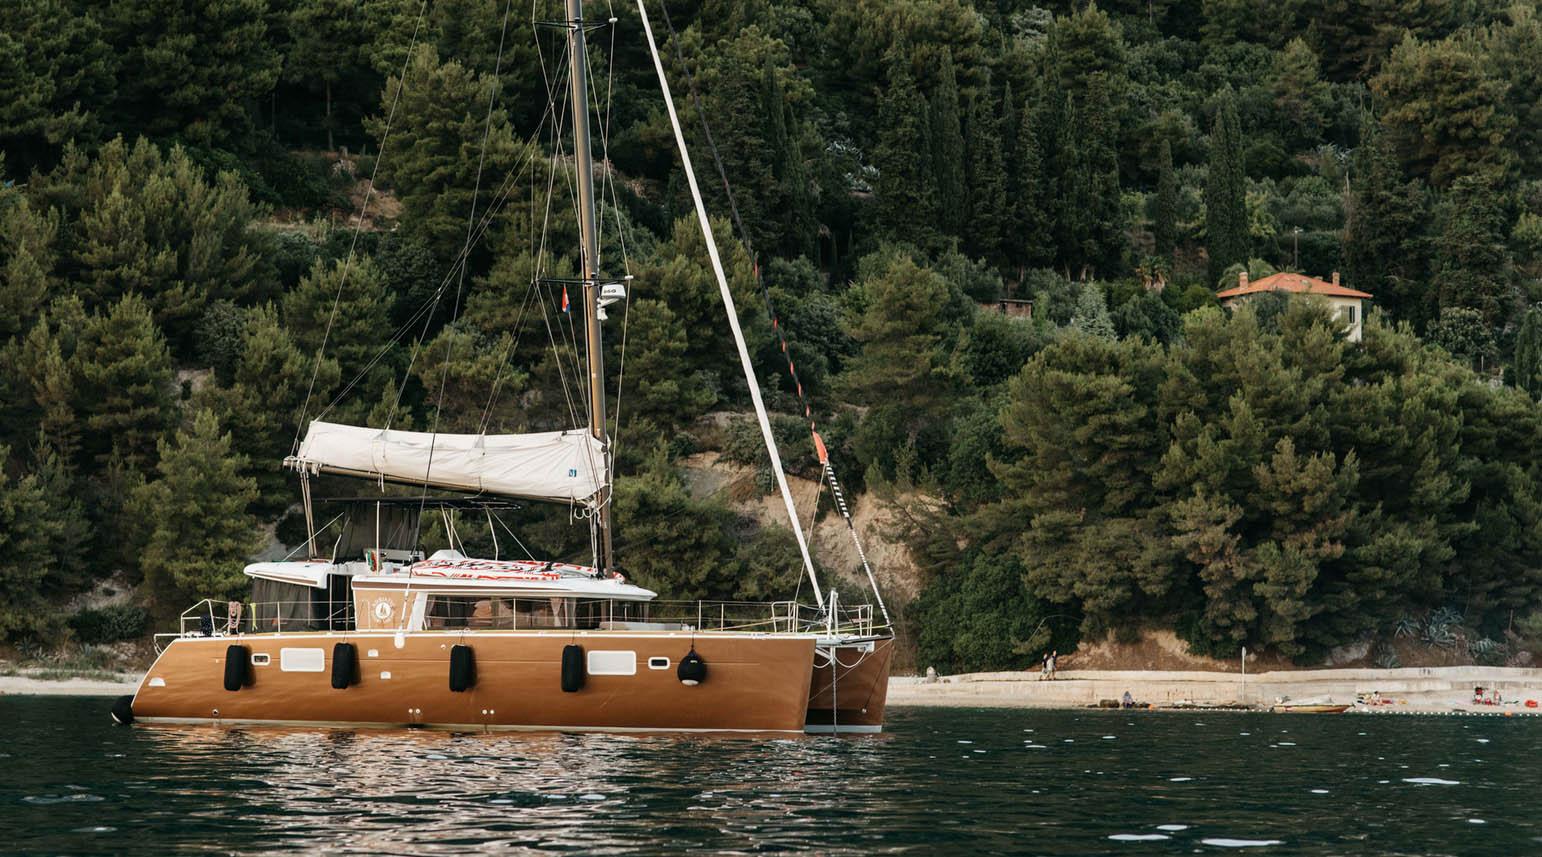 Charter / Catamaran-Charter - Lagoon 450 / Classic Adria